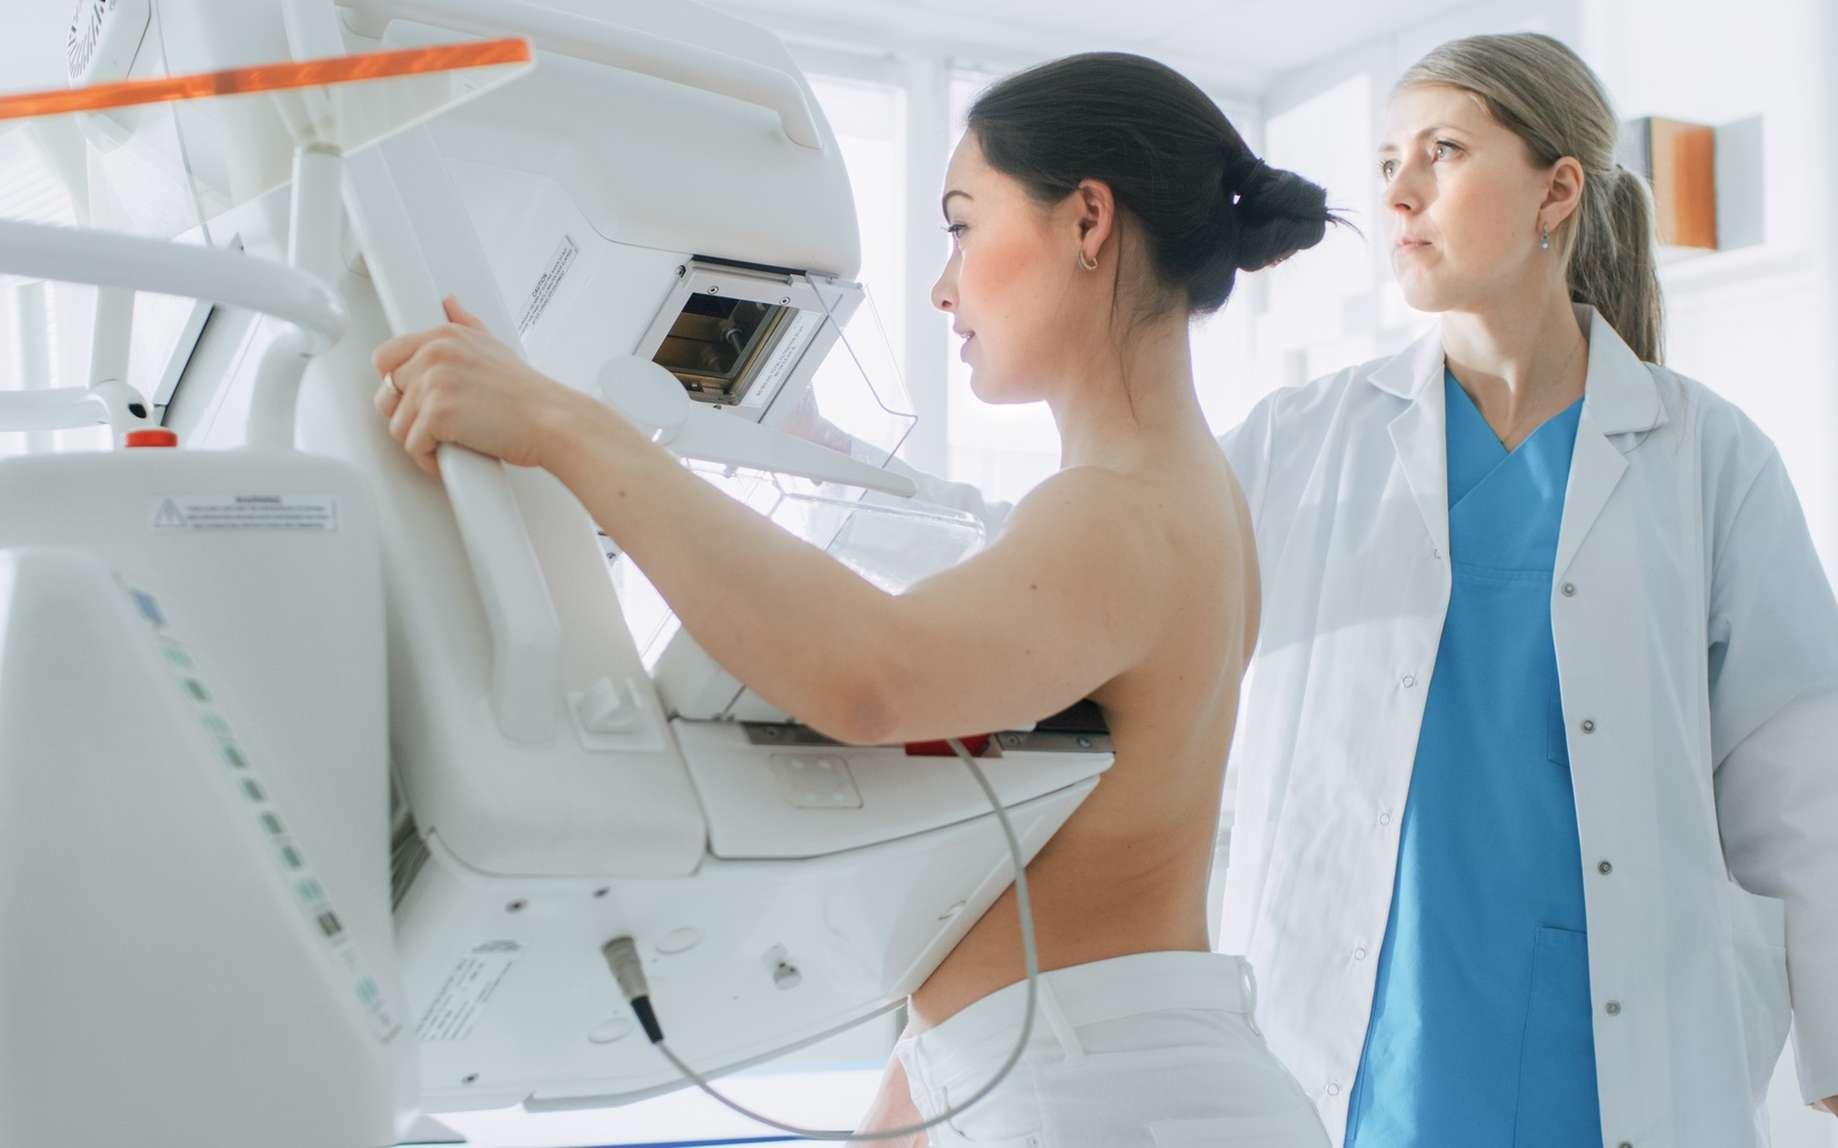 La mammographie consiste en une radiographie du sein. © Gorodenkoff, Fotolia